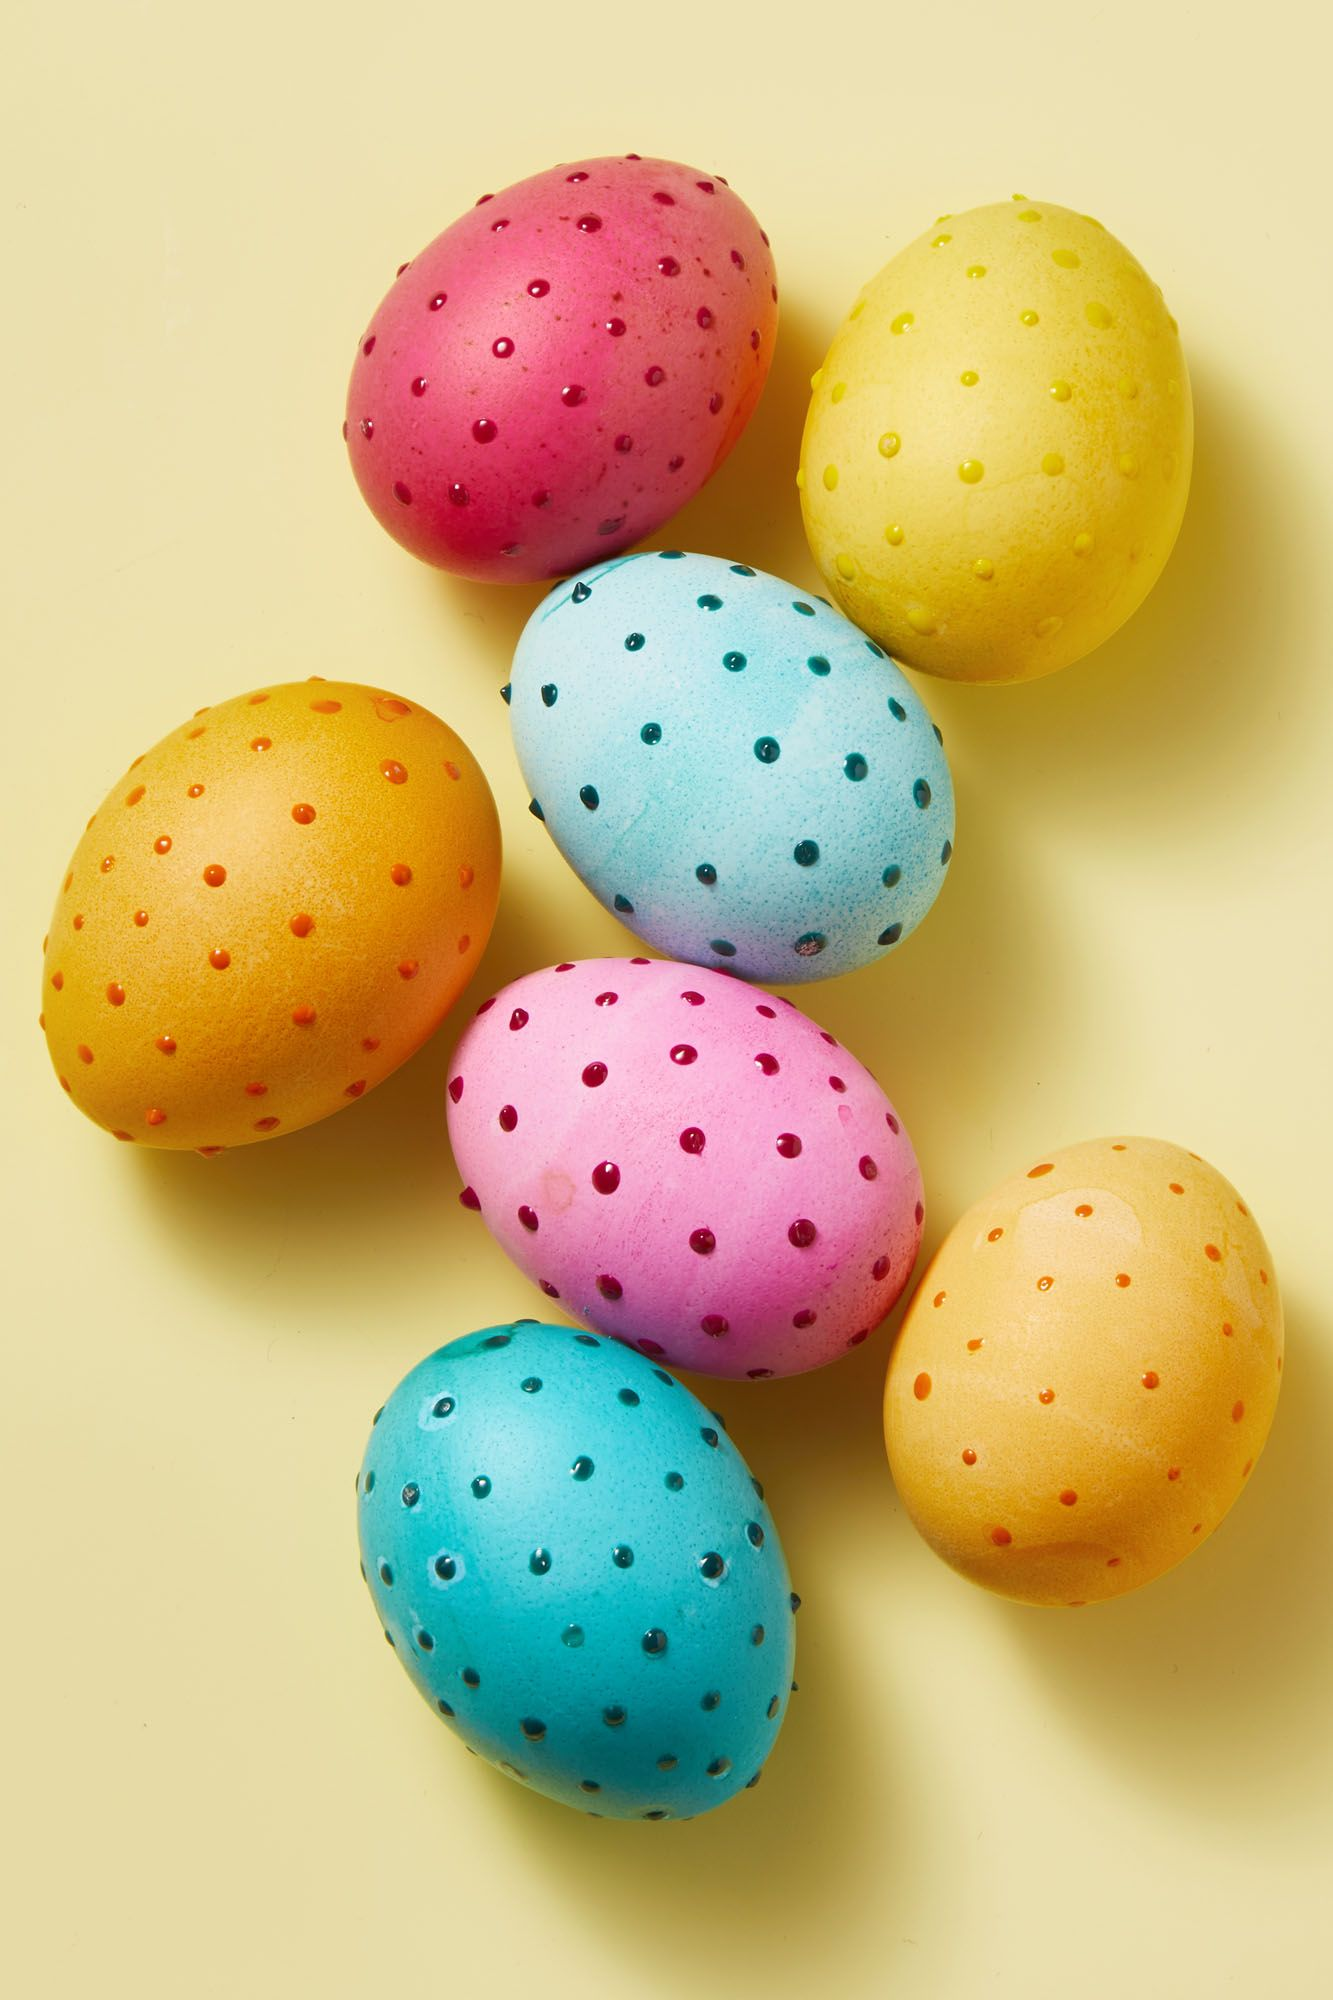 6c370f197 58 Best Easter Egg Designs - Easy DIY Ideas for Easter Egg Decorating